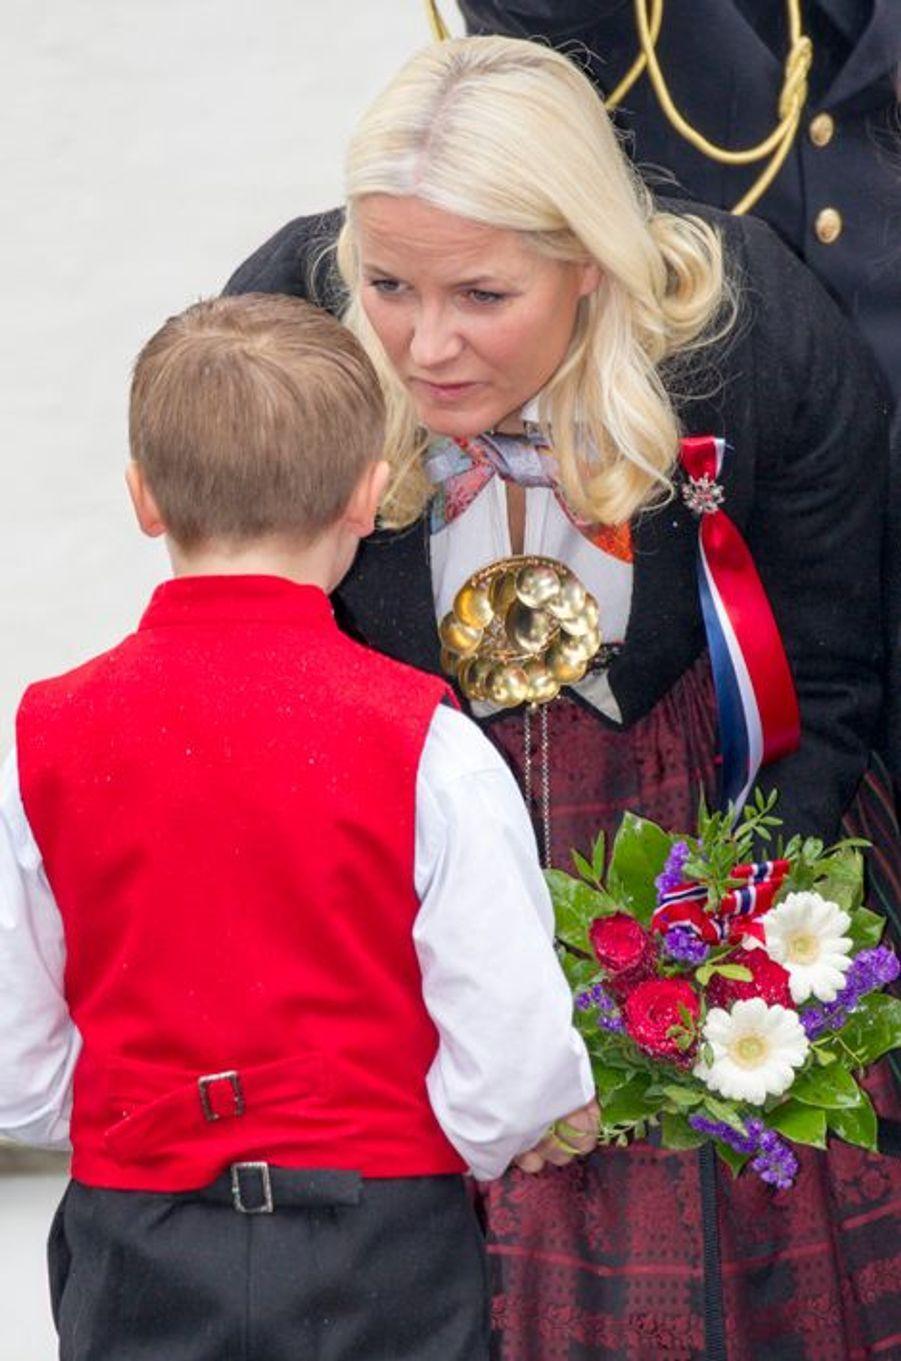 La princesse Mette-Marit de Norvège à Skaugum, le 17 mai 2015